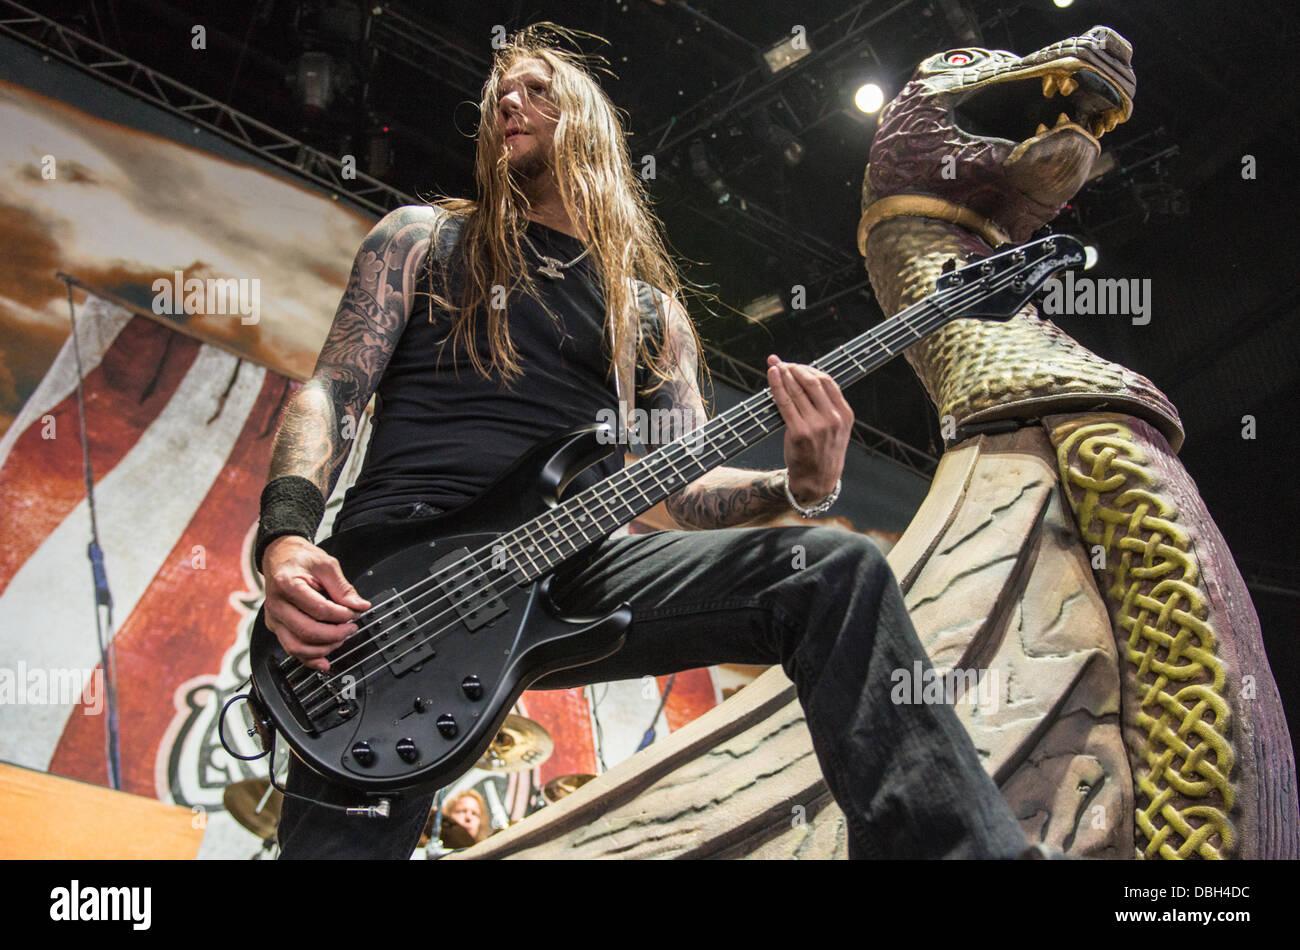 swedish heavy metal band amon amarth performing live at